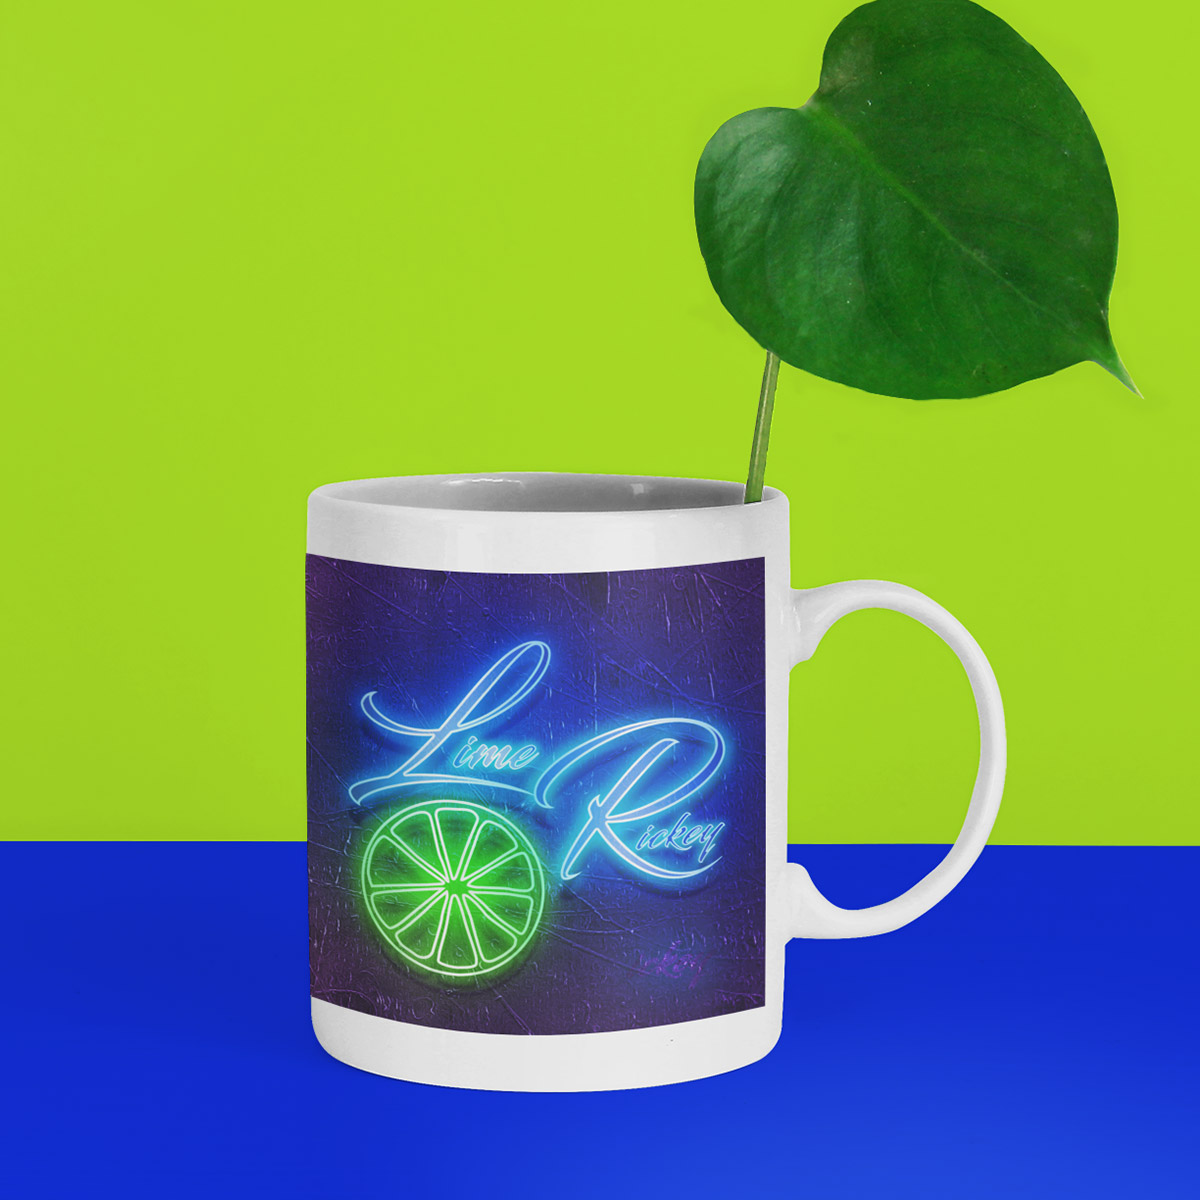 LimeRickey Mug